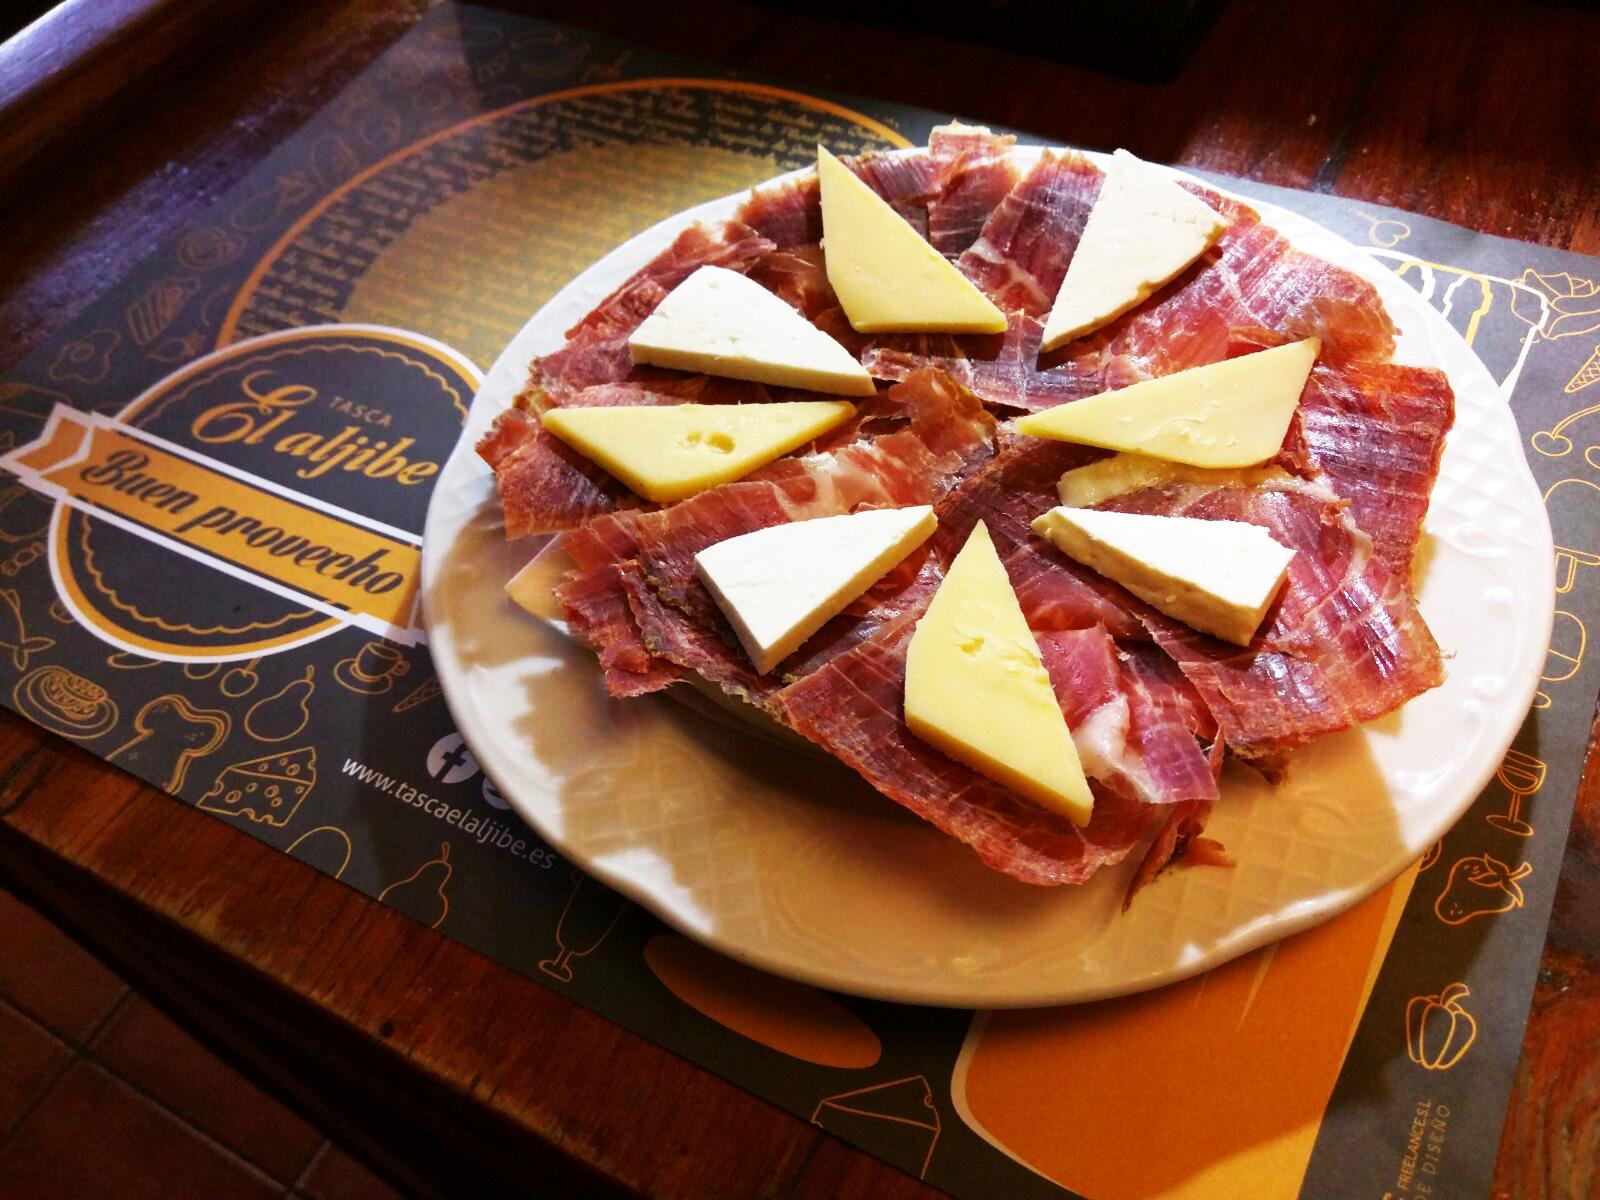 Tapa de jamon iberico y quesos.